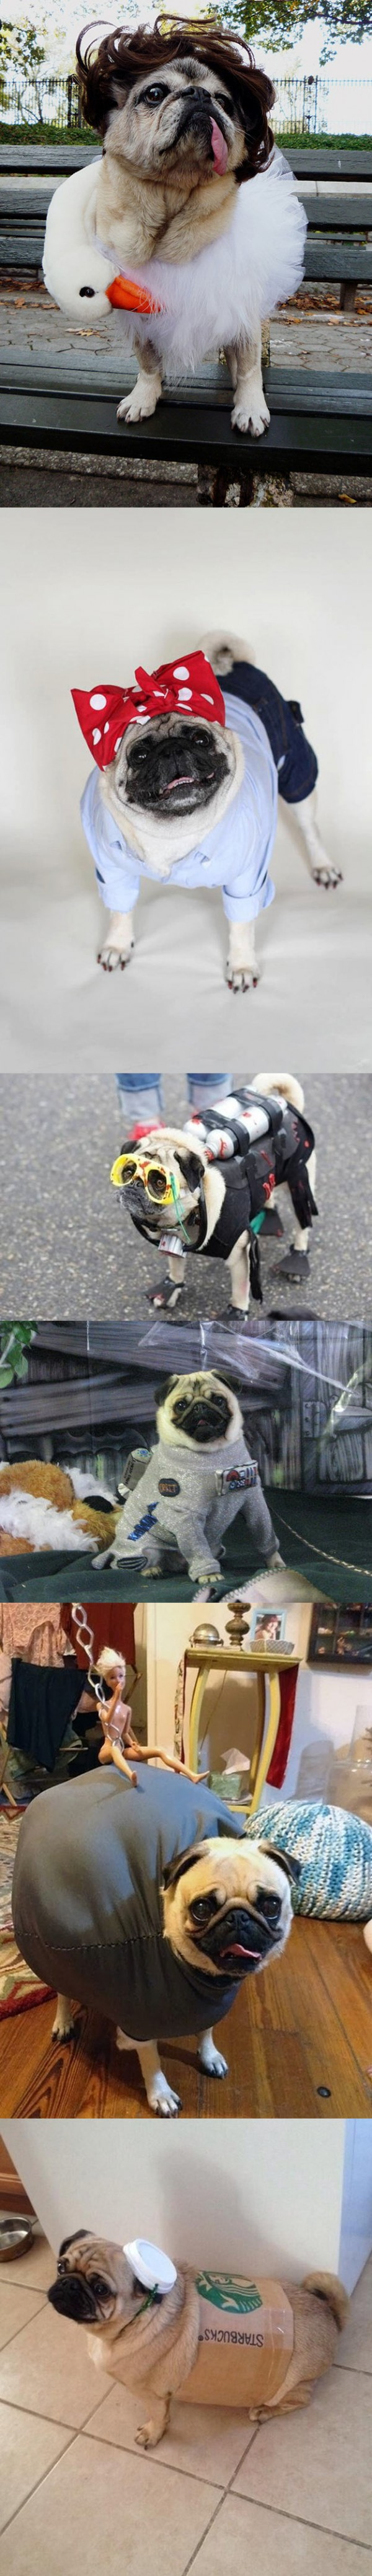 Pugs disfrazados